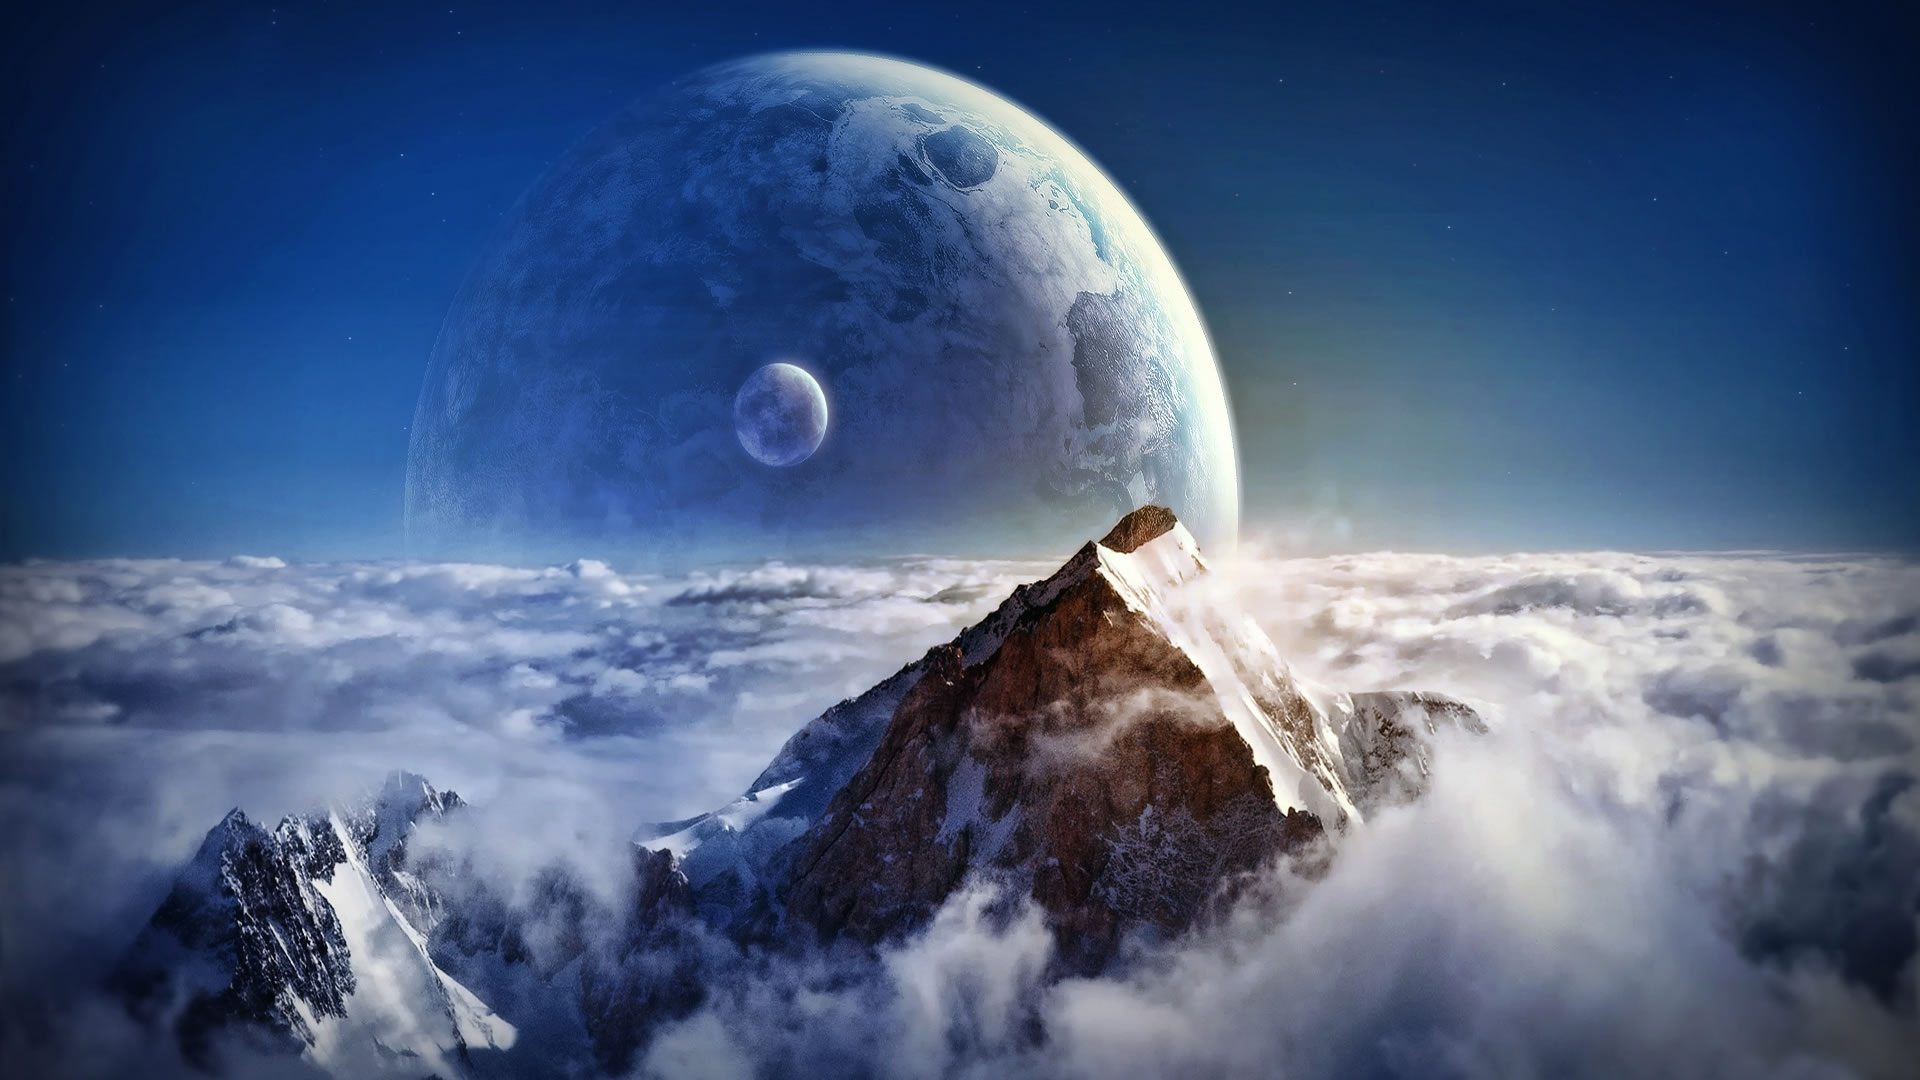 mountain peaks fantasy wallpaper 33576